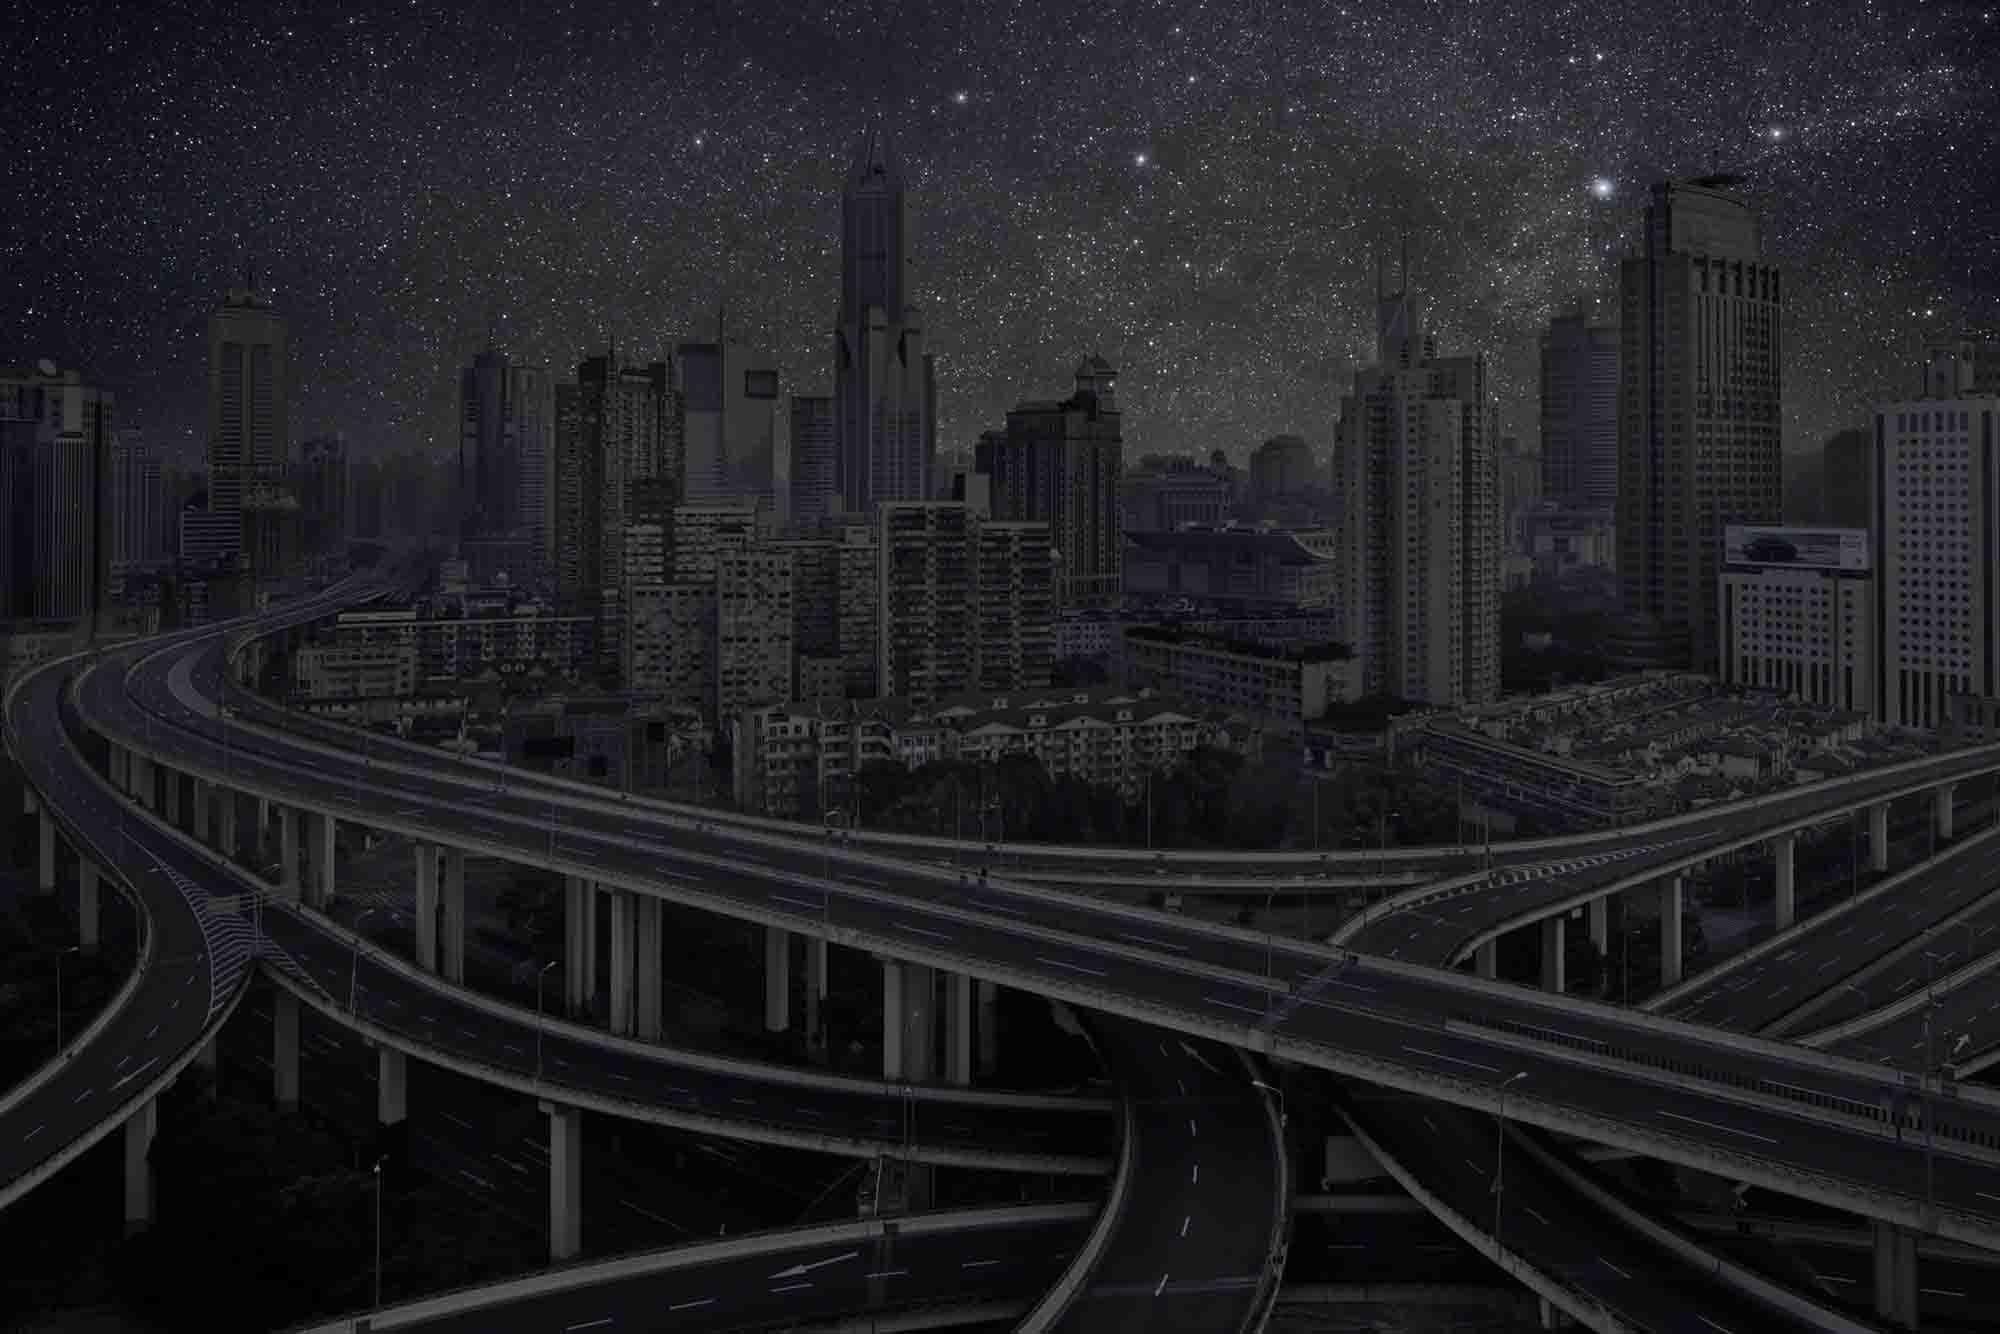 Shanghai 31° 13' 22'' N 2012-03-17 lst 14:47<br/>Darkened Cities - Villes éteintes